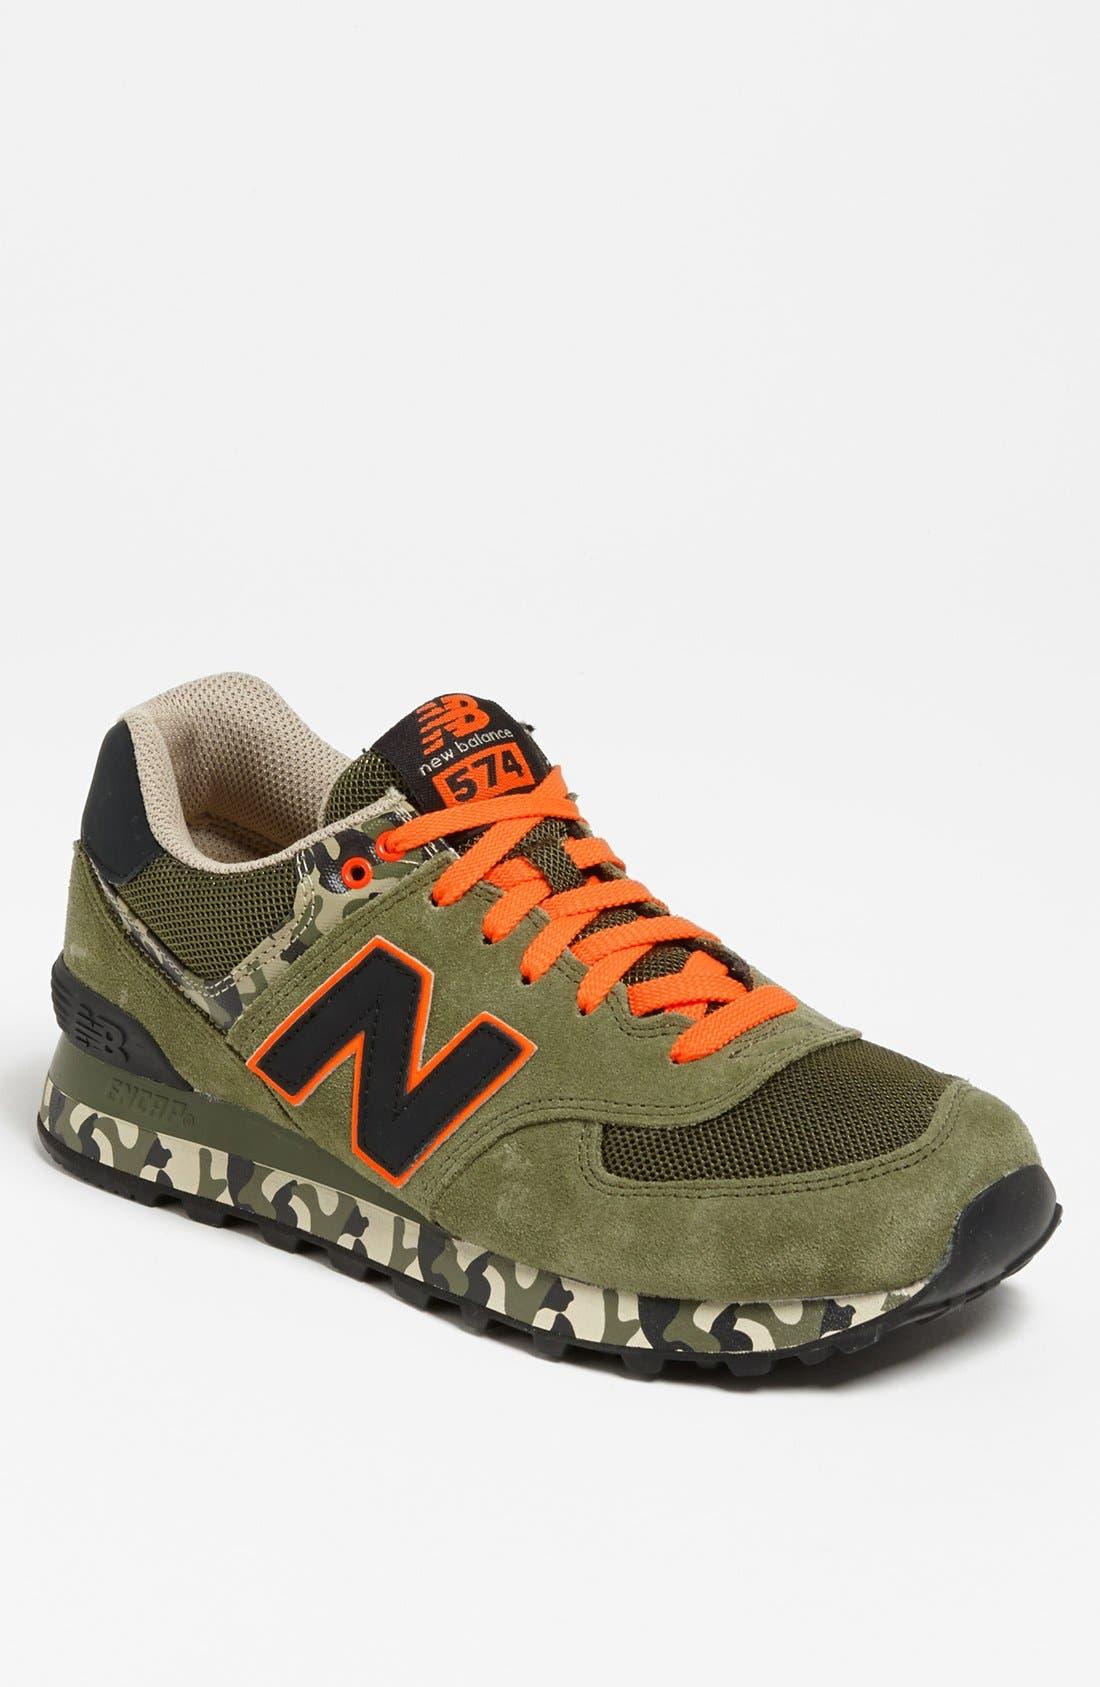 Main Image - New Balance '574 Camo' Sneaker (Men)